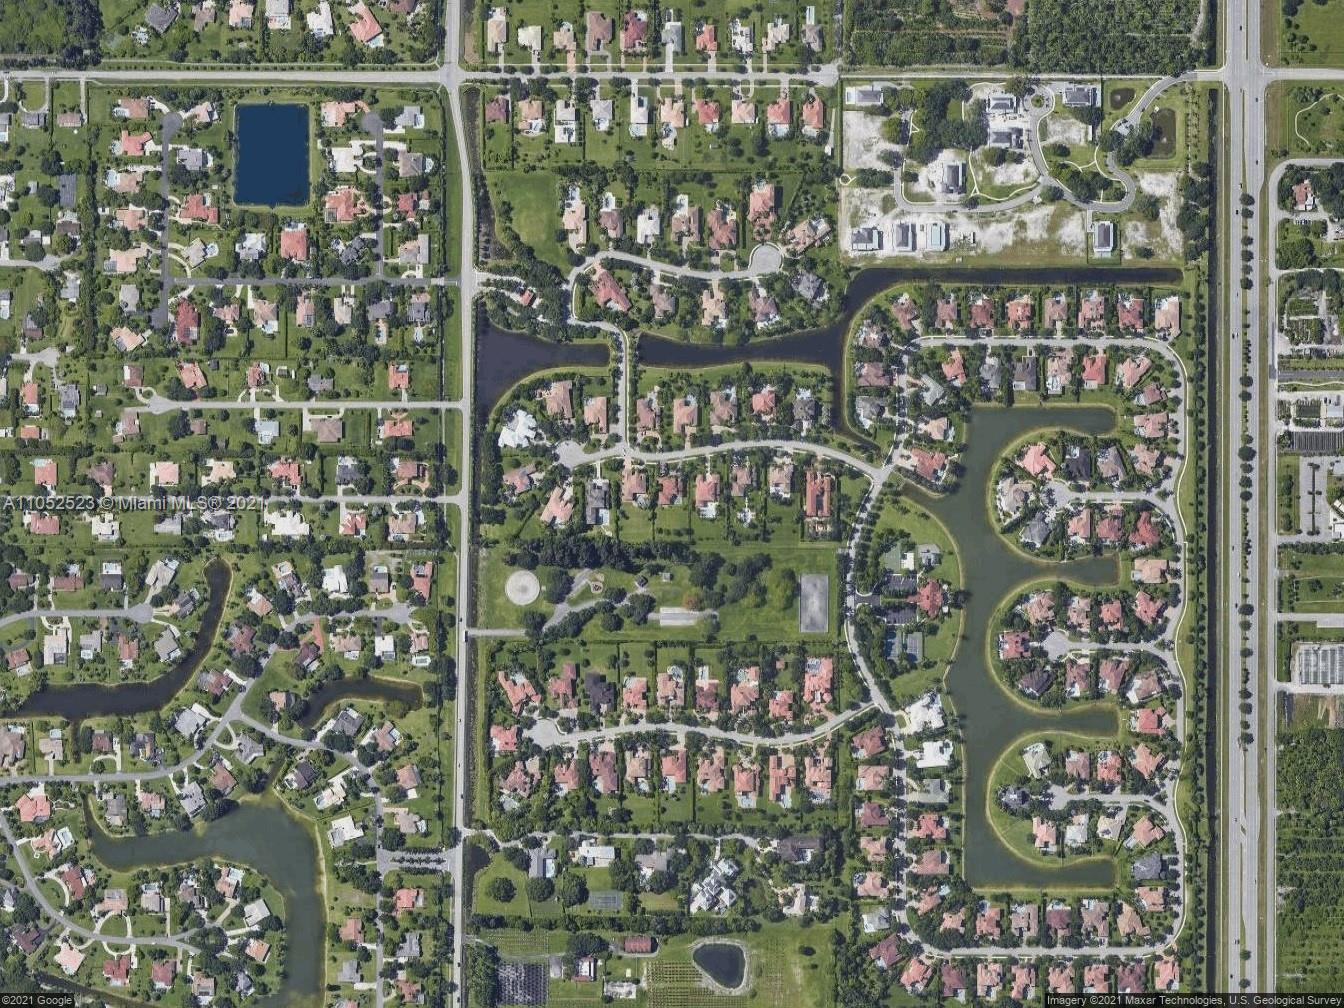 Kapok Grove Estates - 12824 Stonebrook Dr, Davie, FL 33330